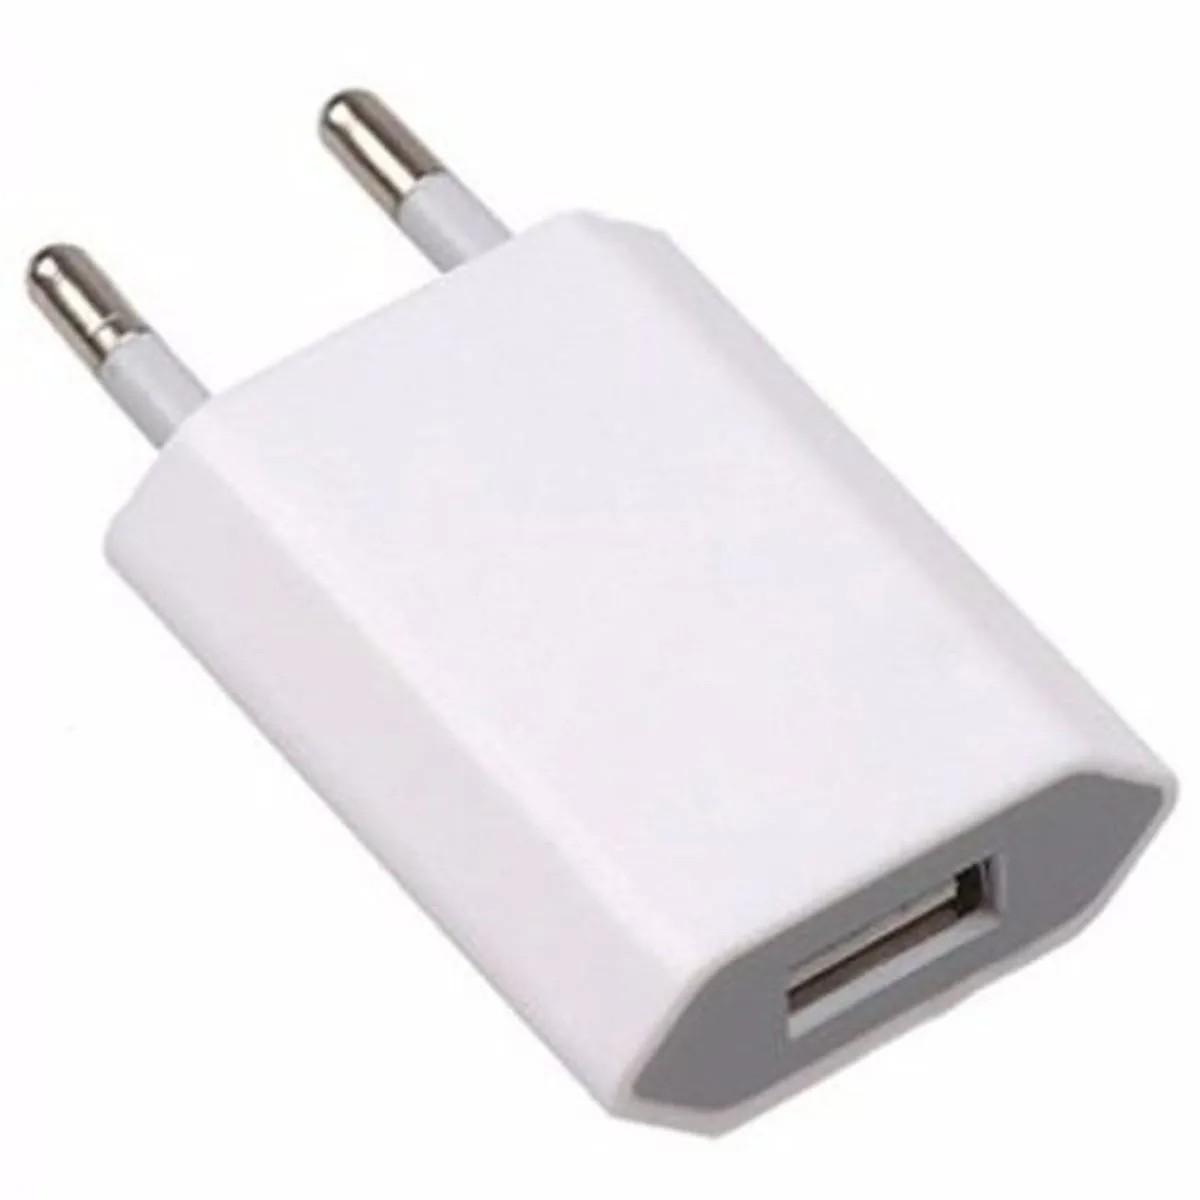 Fonte USB